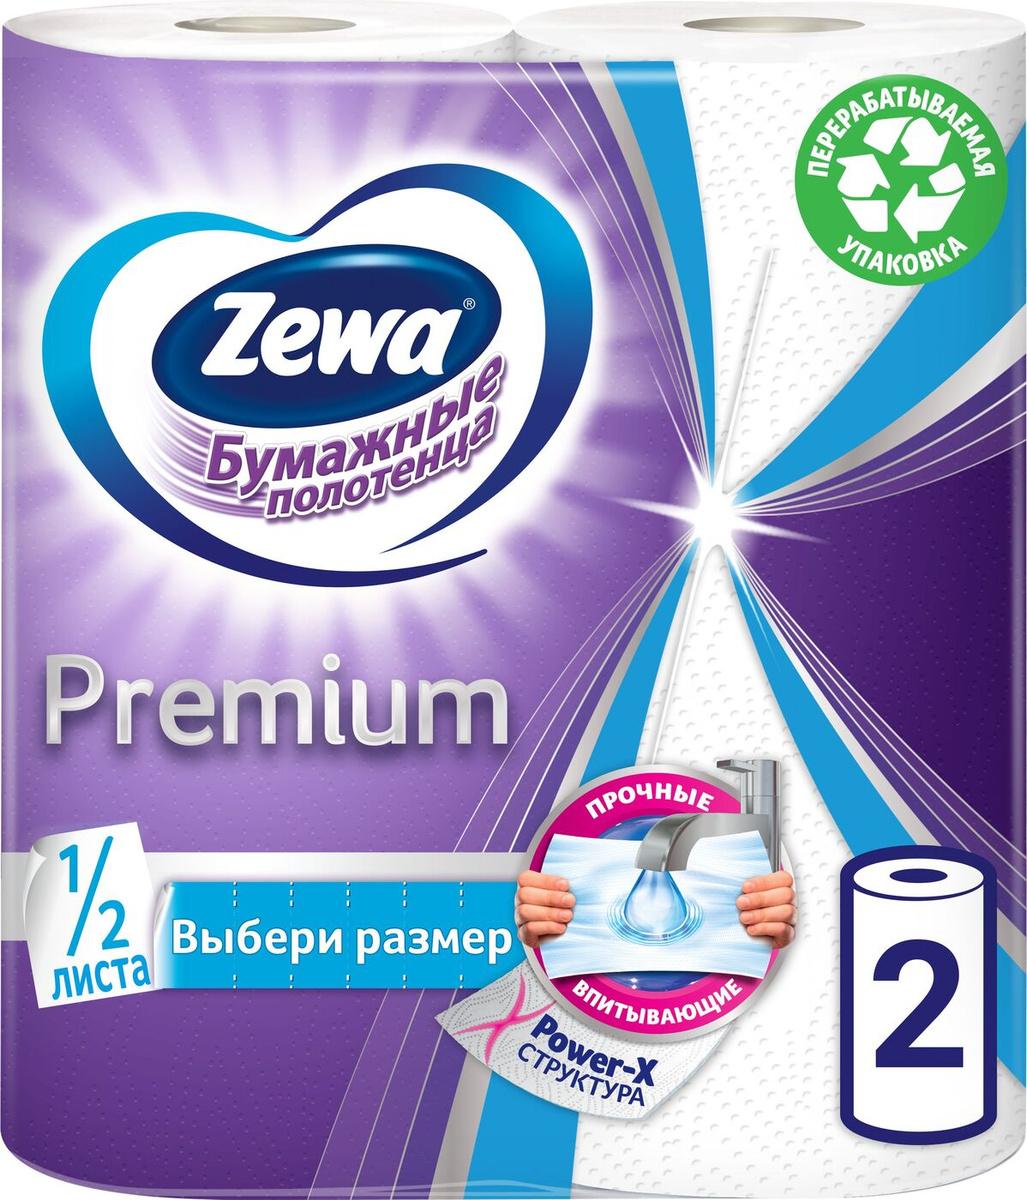 Zewa — Wisch&Weg